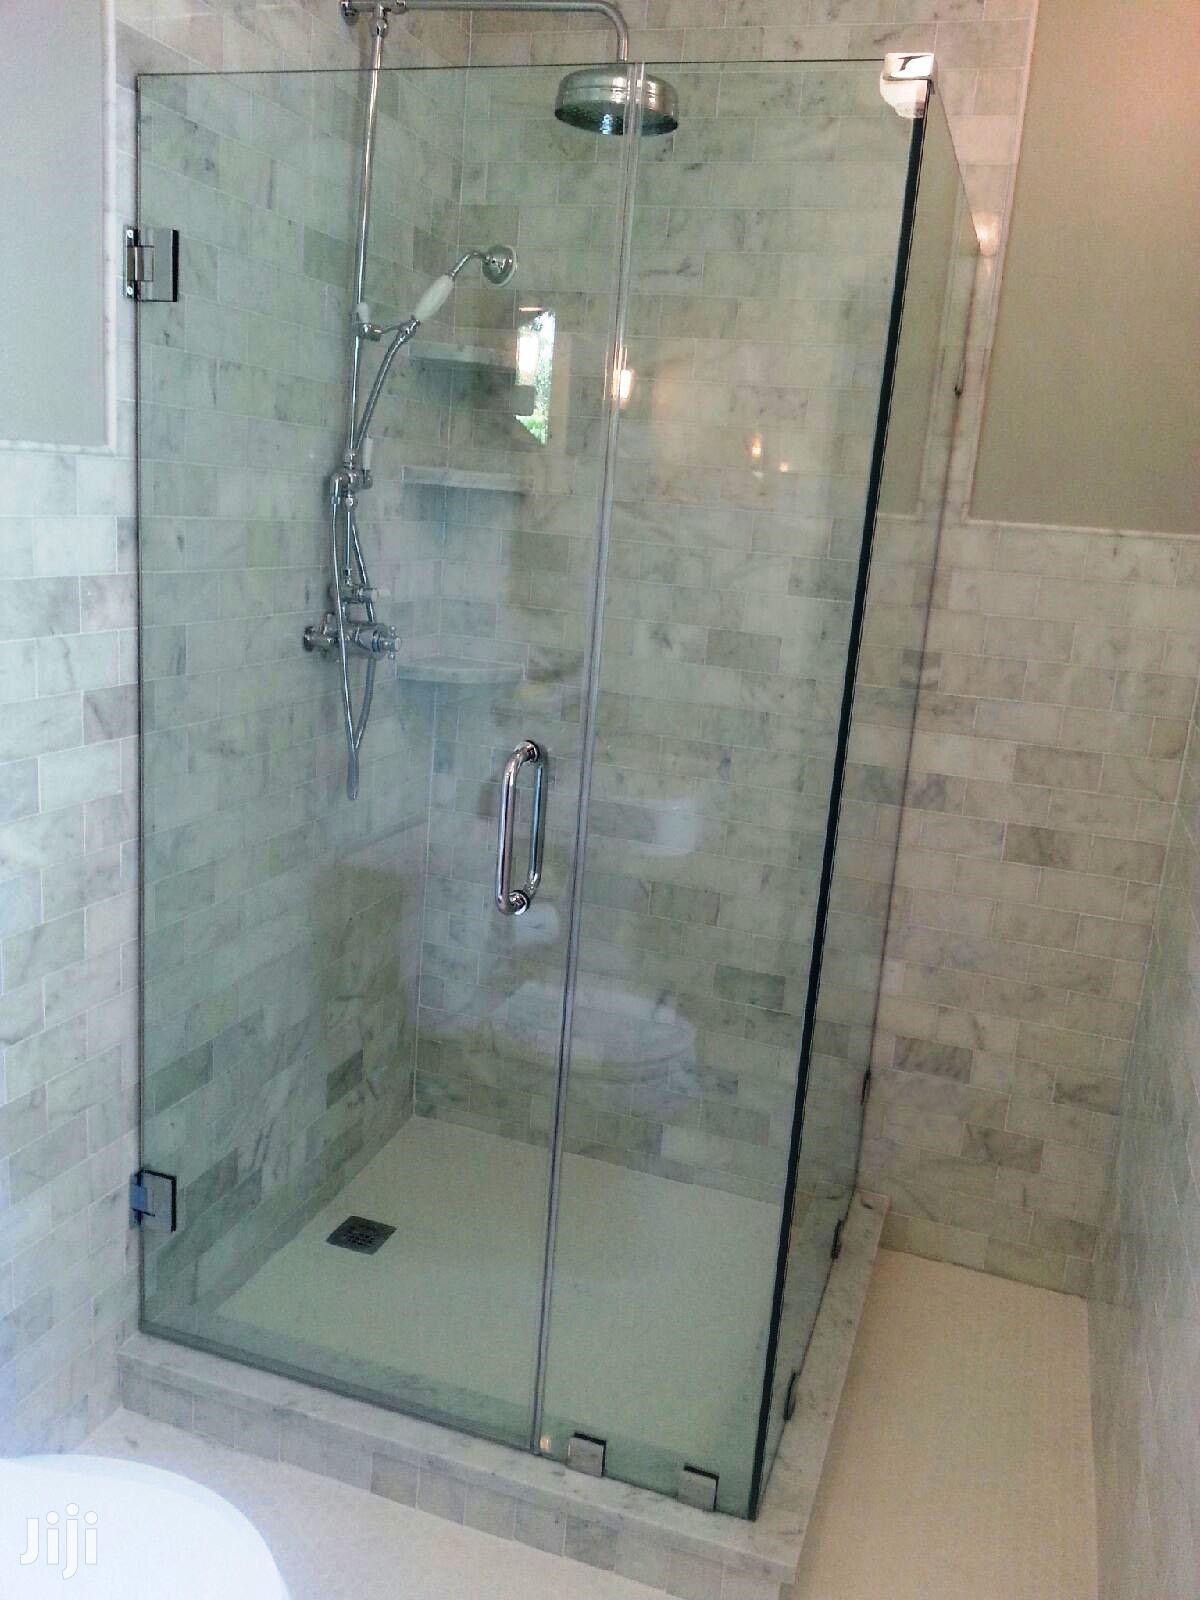 "Shower Cubicle Or Bathroom Glass 39"" X 39"" X 75"" 100% Watertight"